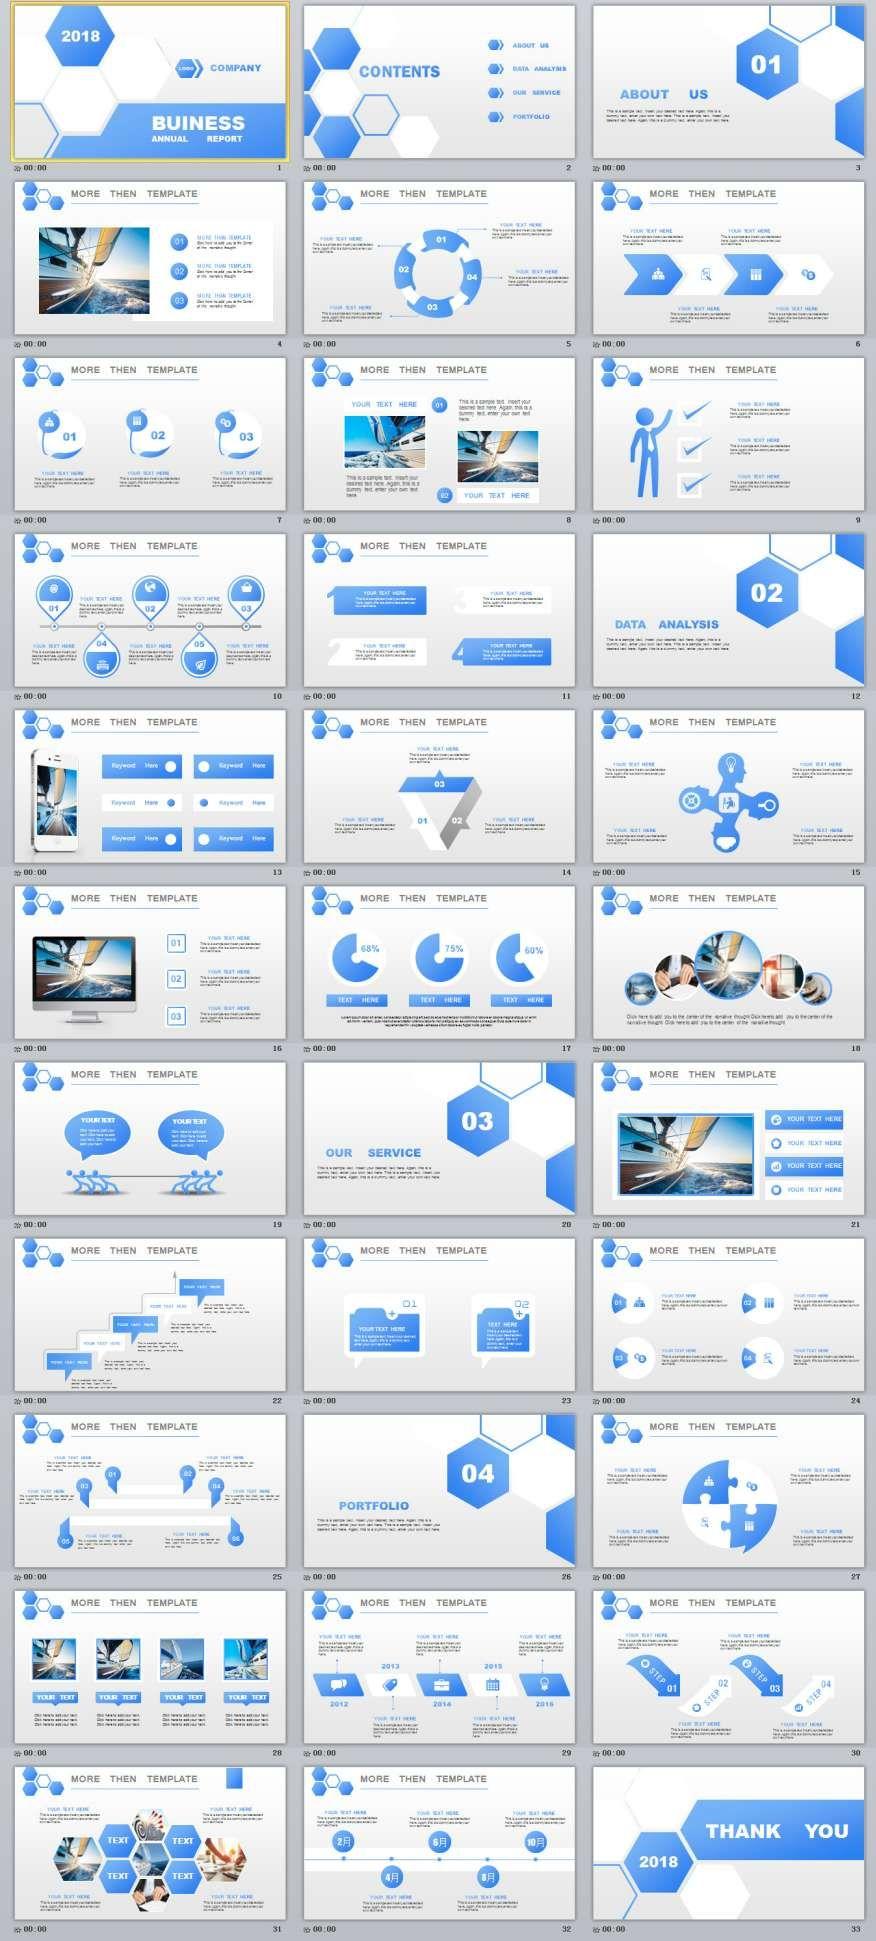 33 blue lowpoly business report powerpoint templates template 33 blue lowpoly business report powerpoint templates toneelgroepblik Choice Image